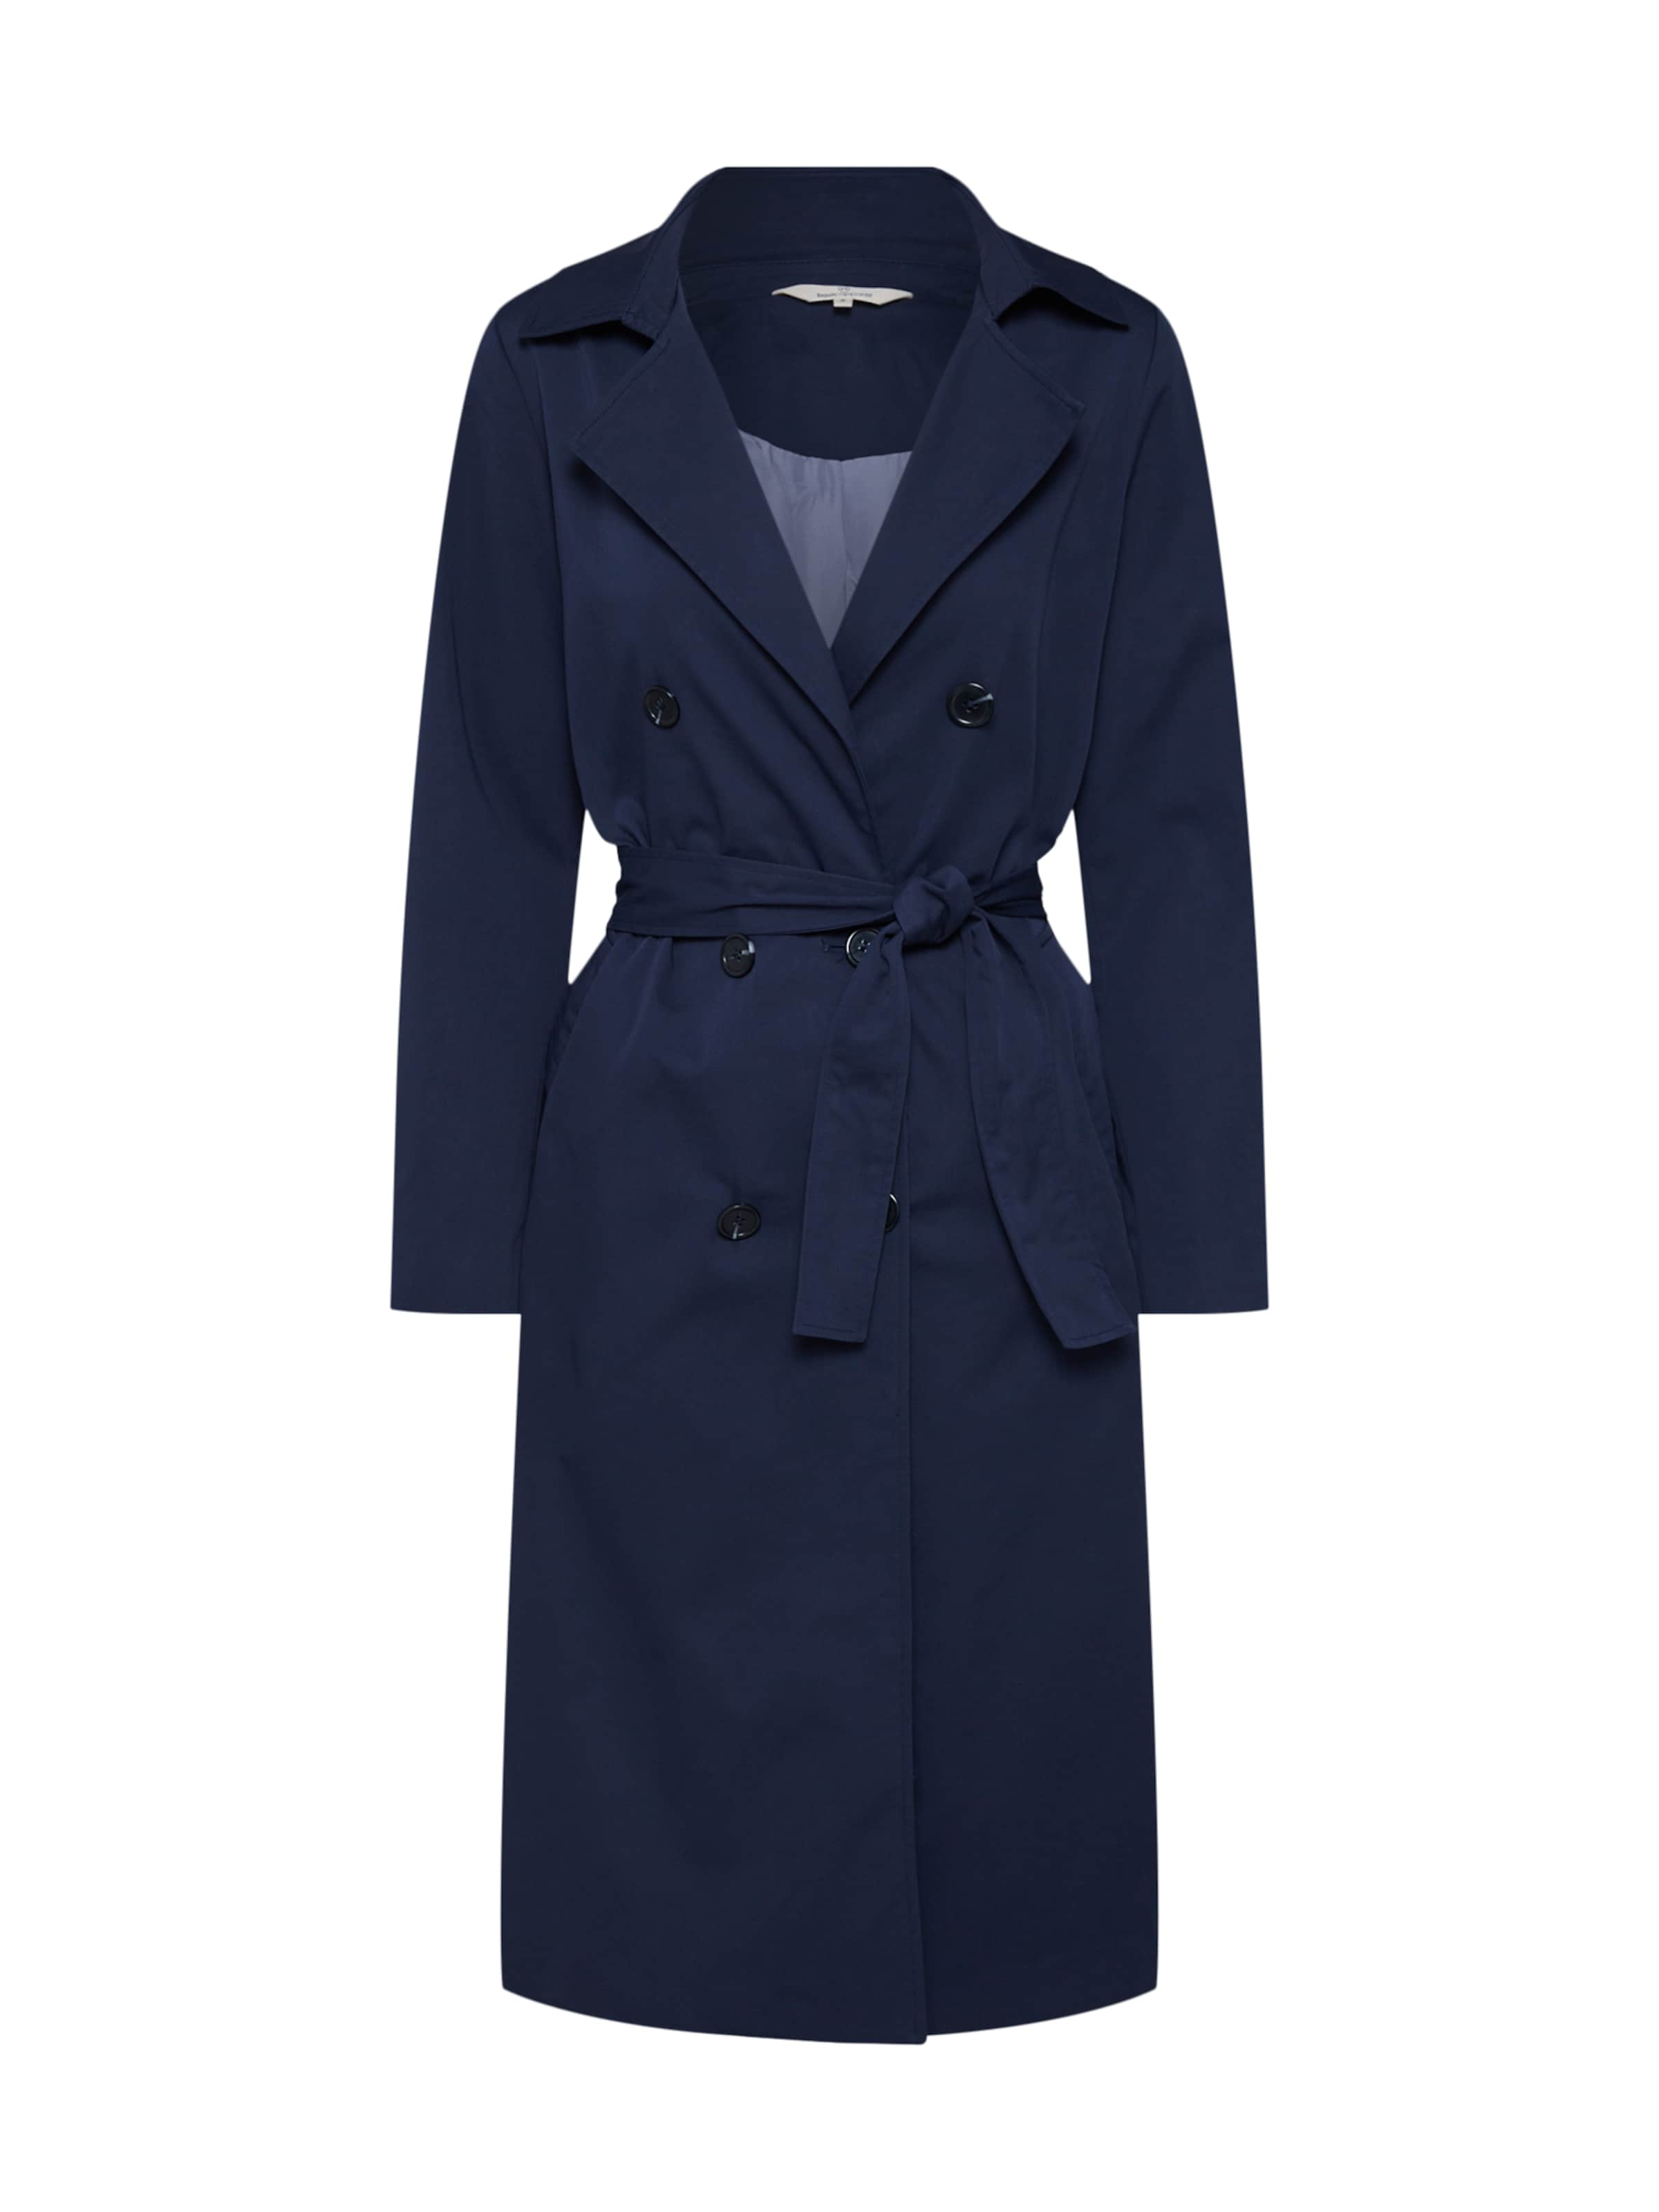 Jacket' Bleu Apparel Manteau 'greta Mi Marine En saison Basic WHYI9DE2